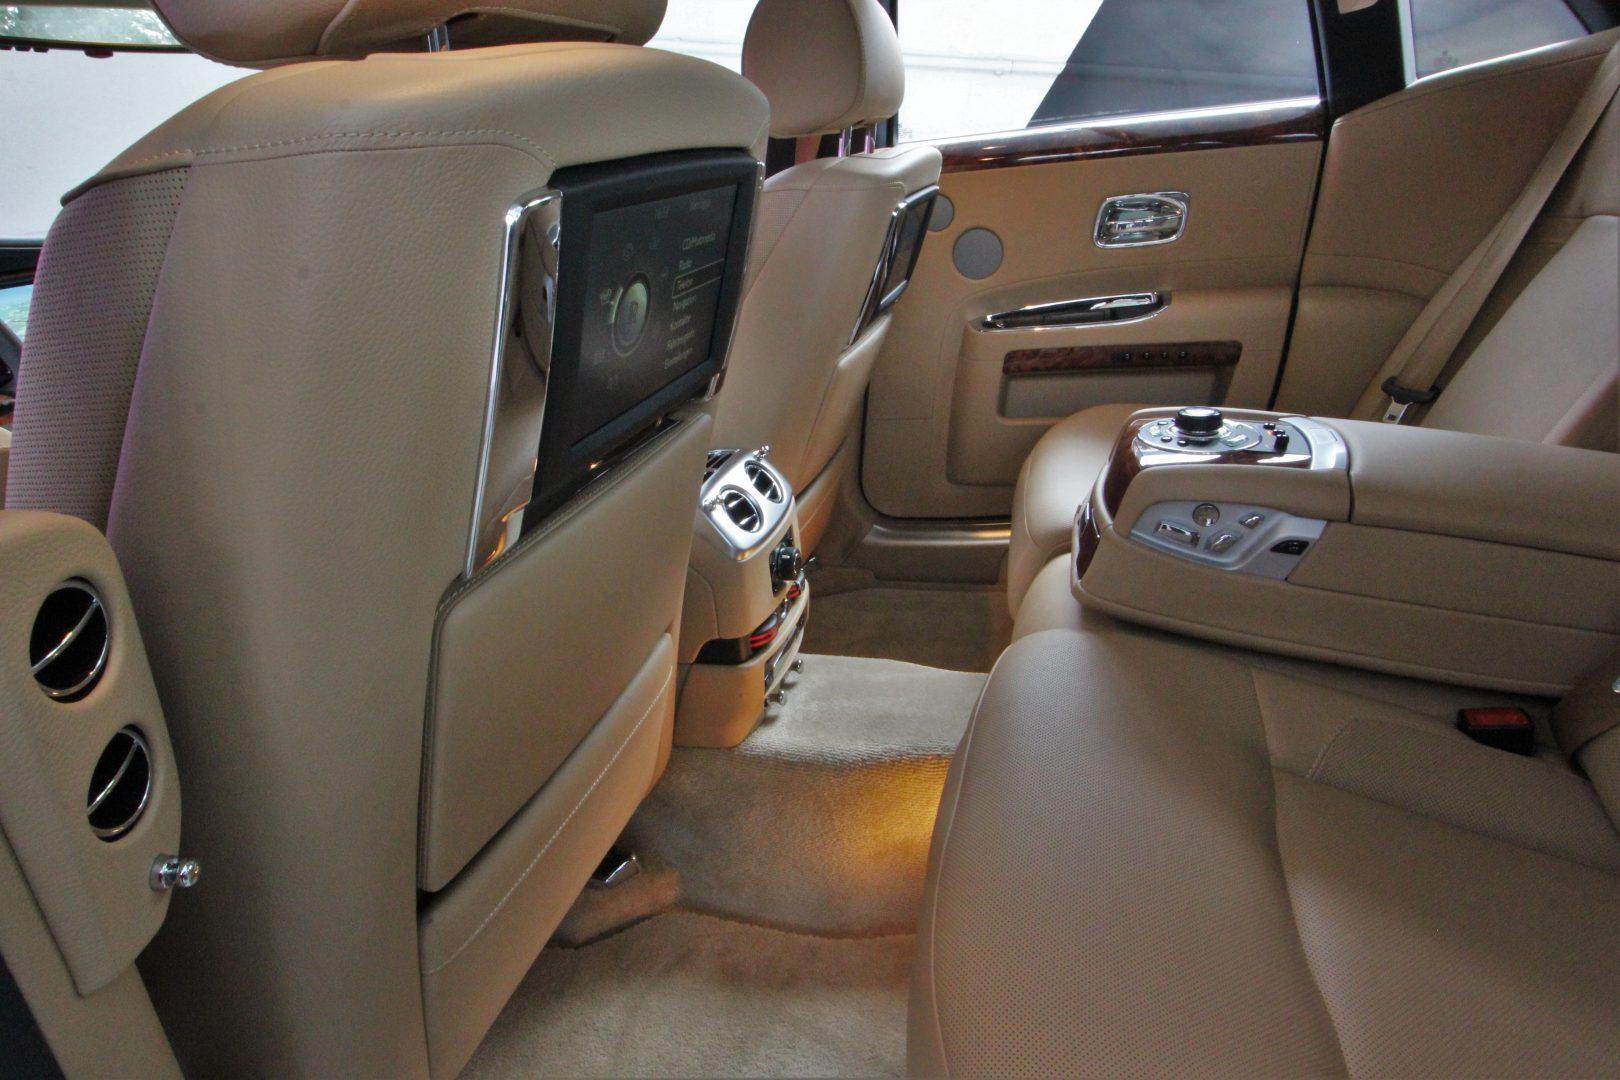 AIL Rolls Royce Ghost 6.6 V12  9